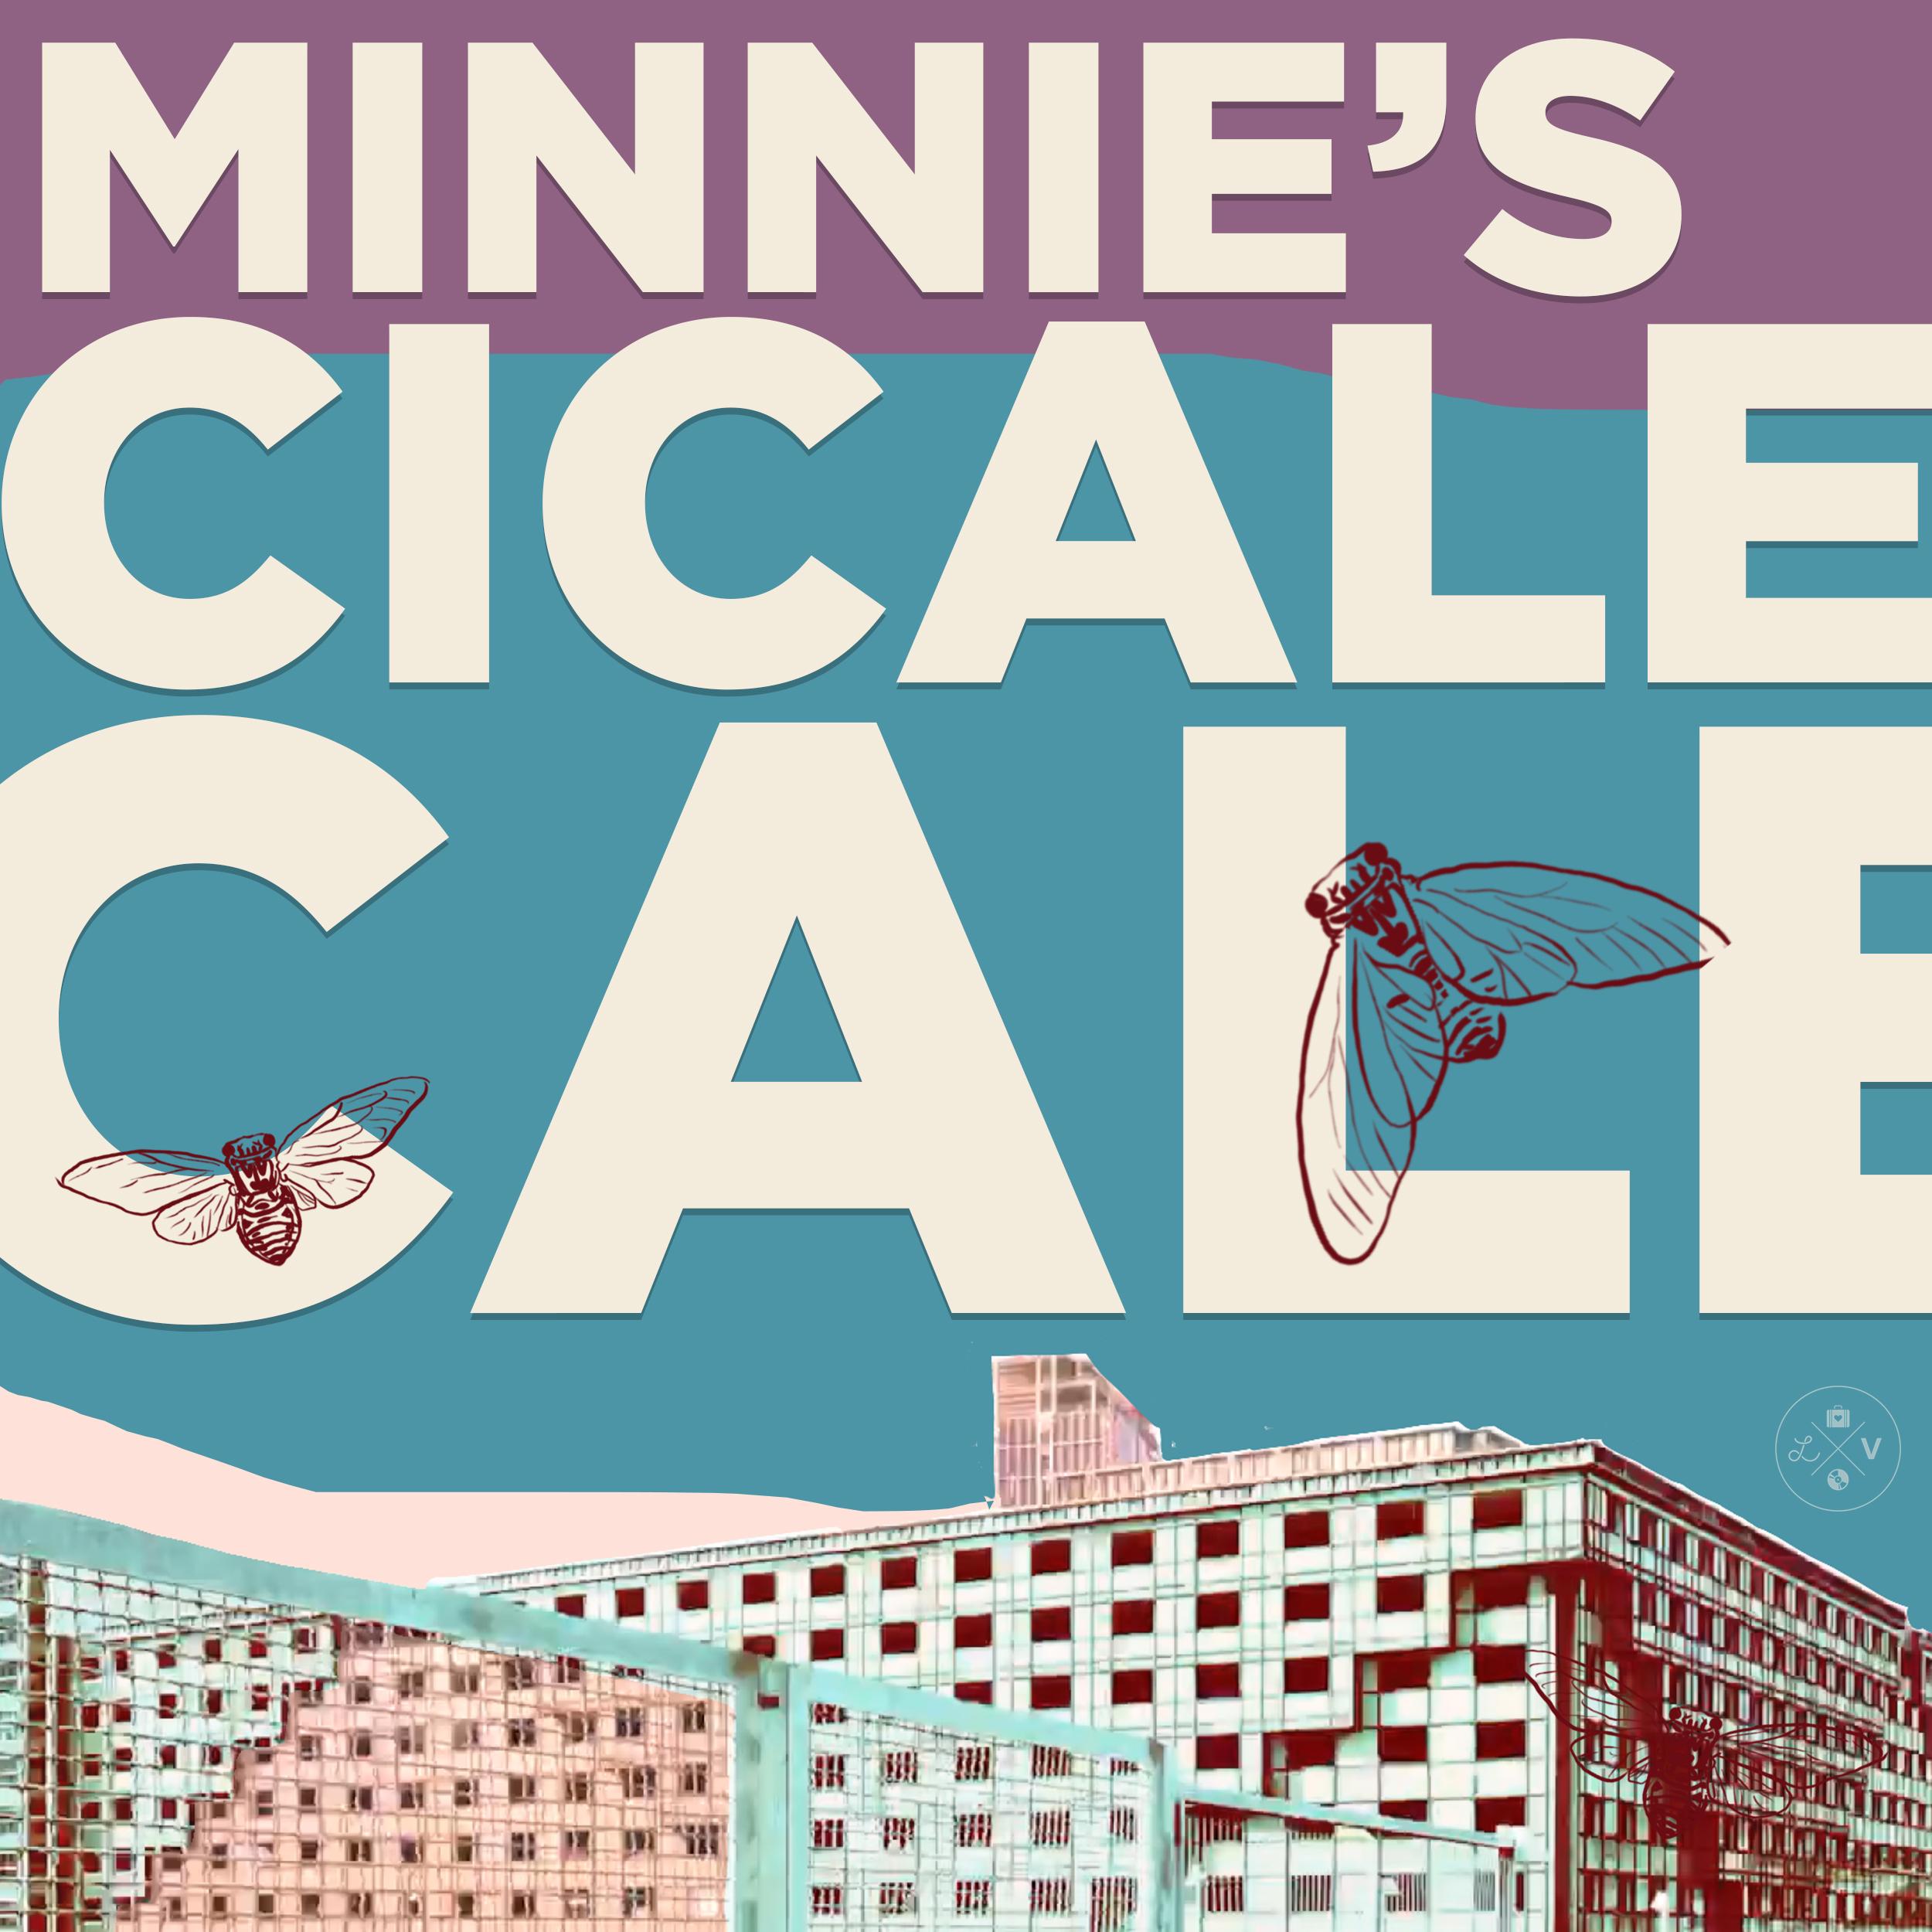 Minnie's - Cicale.jpg